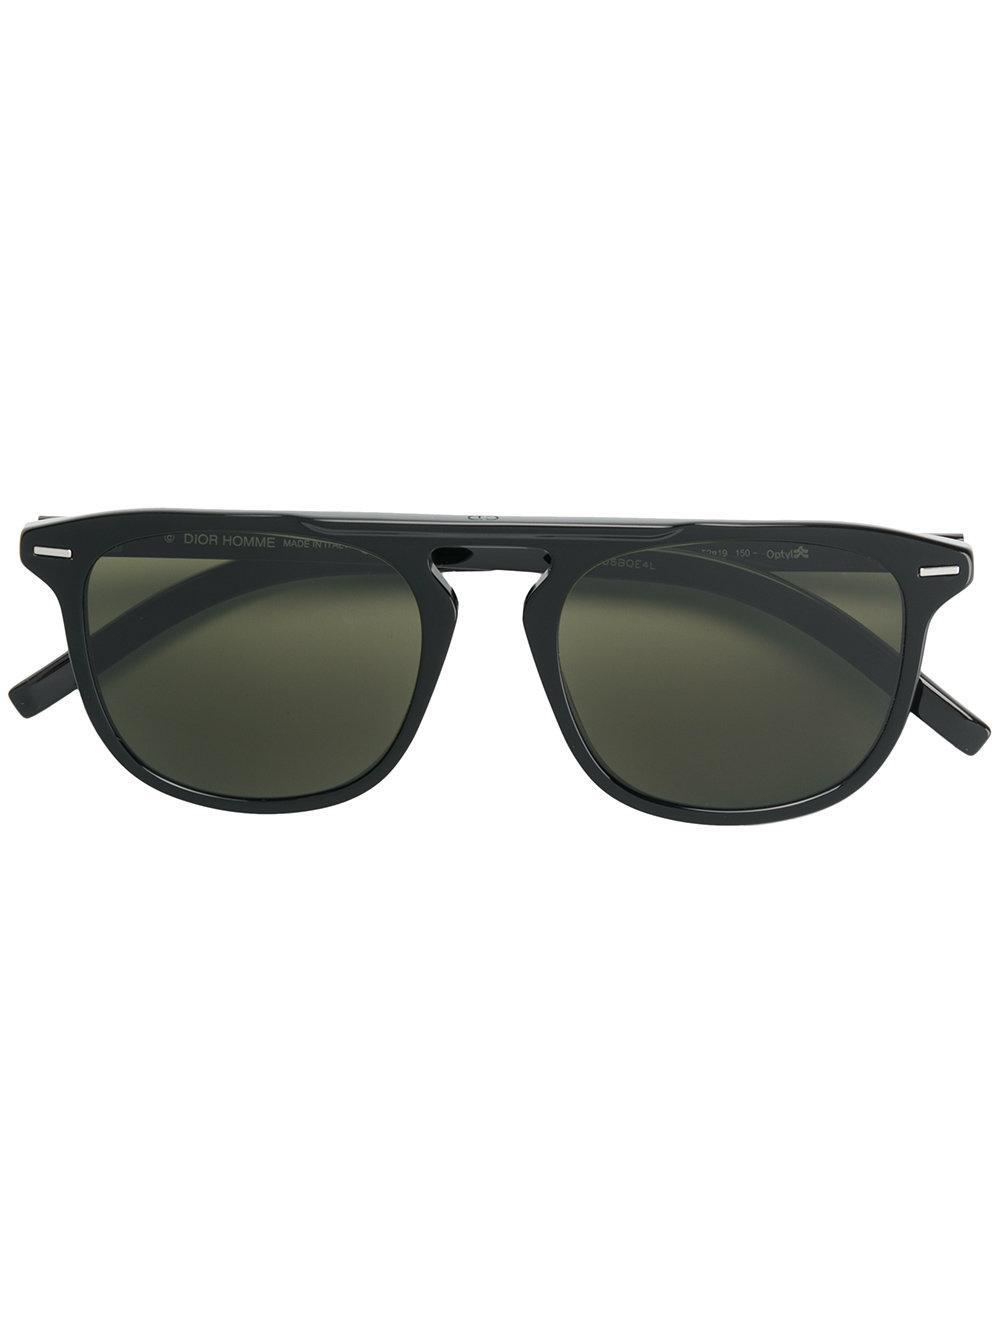 ac15b7c61160 Dior Eyewear Square Frame Sunglasses - Black